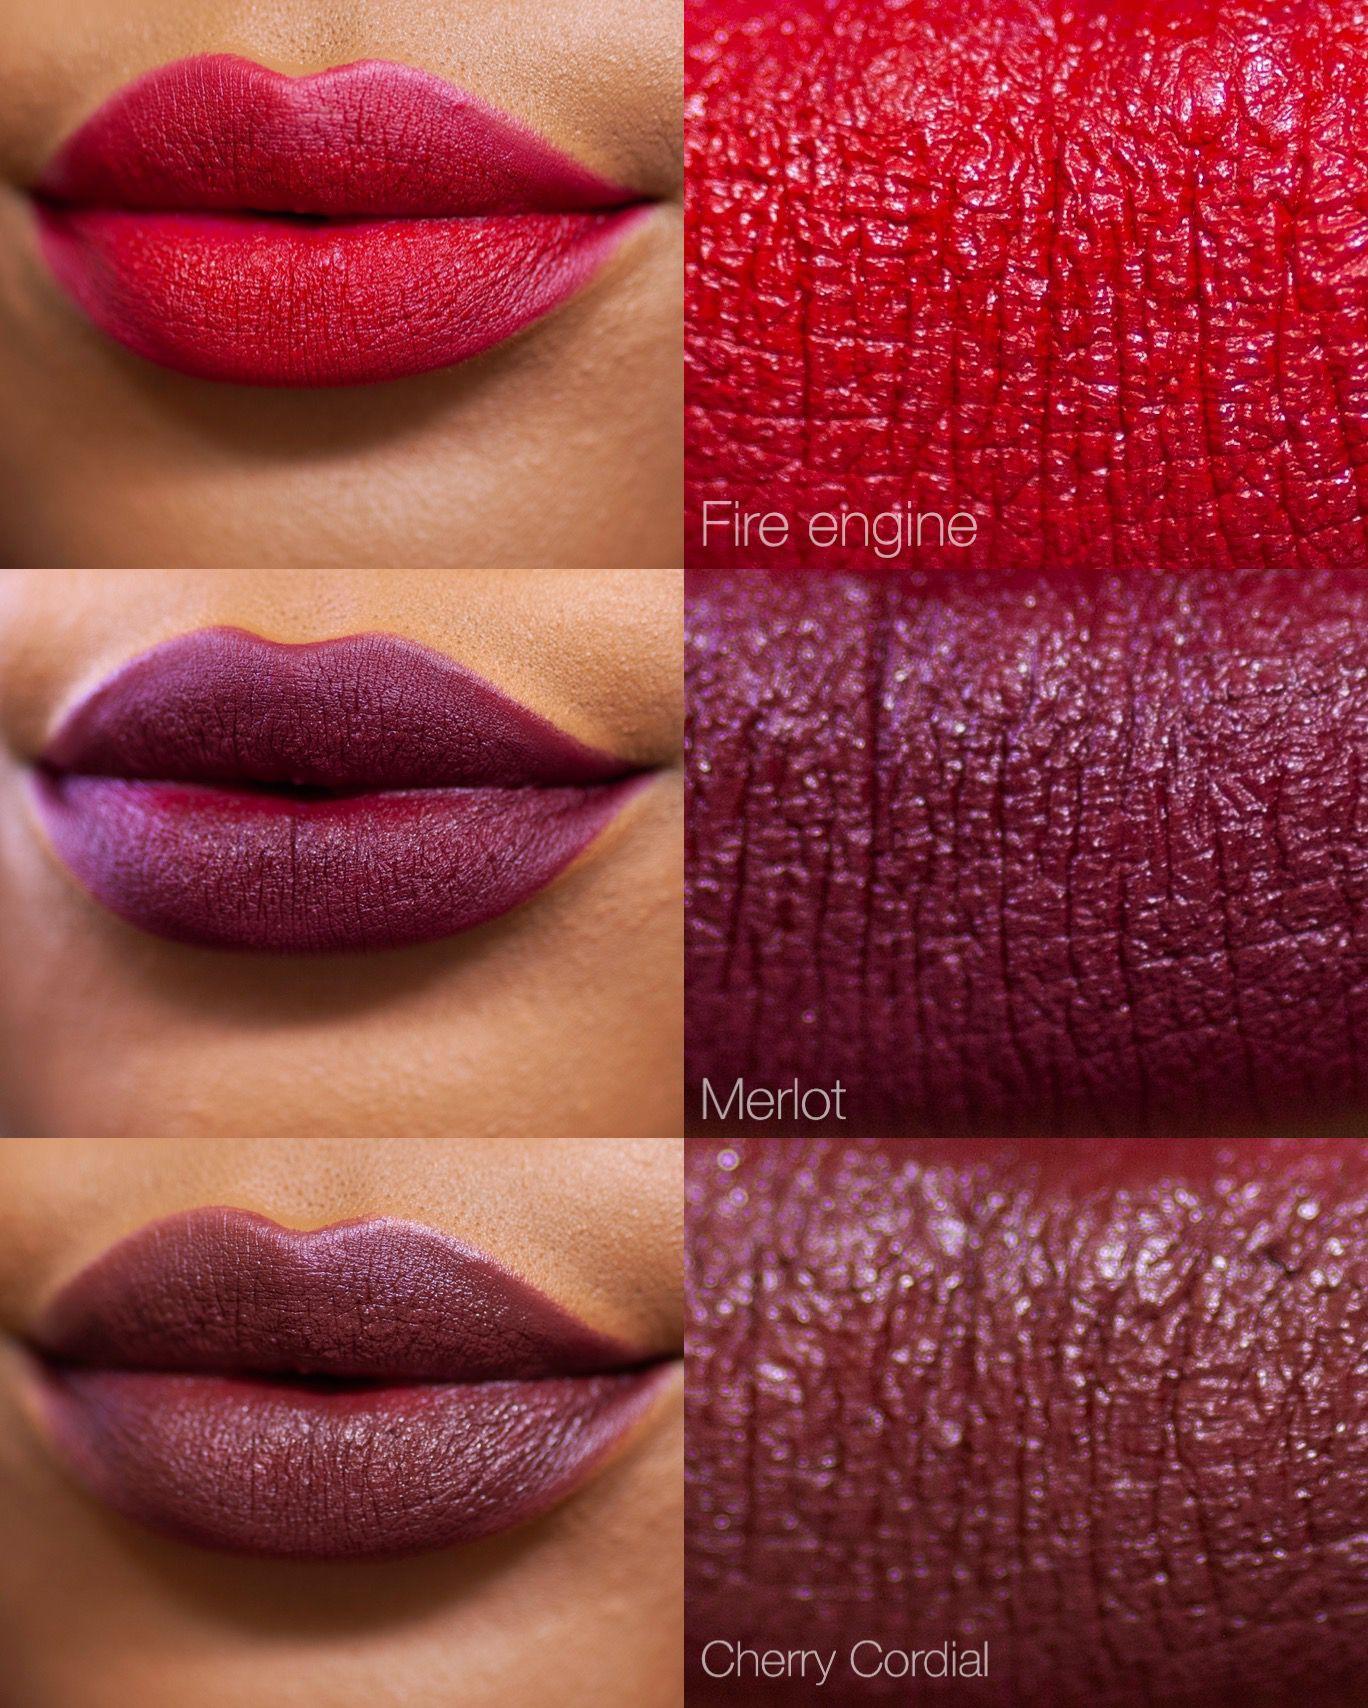 Lippie Love : Gerard Cosmetics Lipsticks